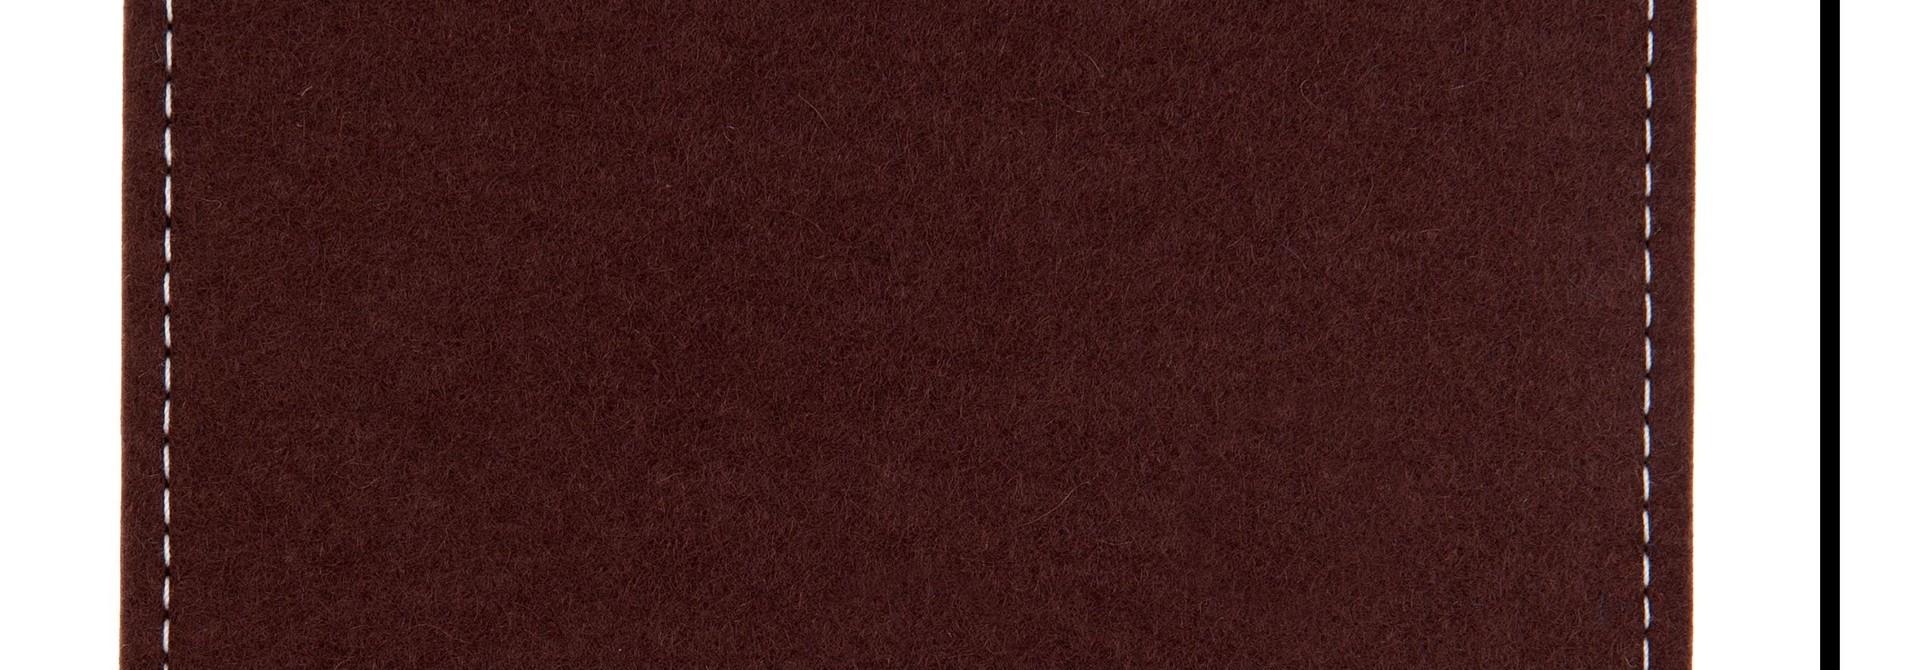 Individuelles Tablet Sleeve Dunkelbraun